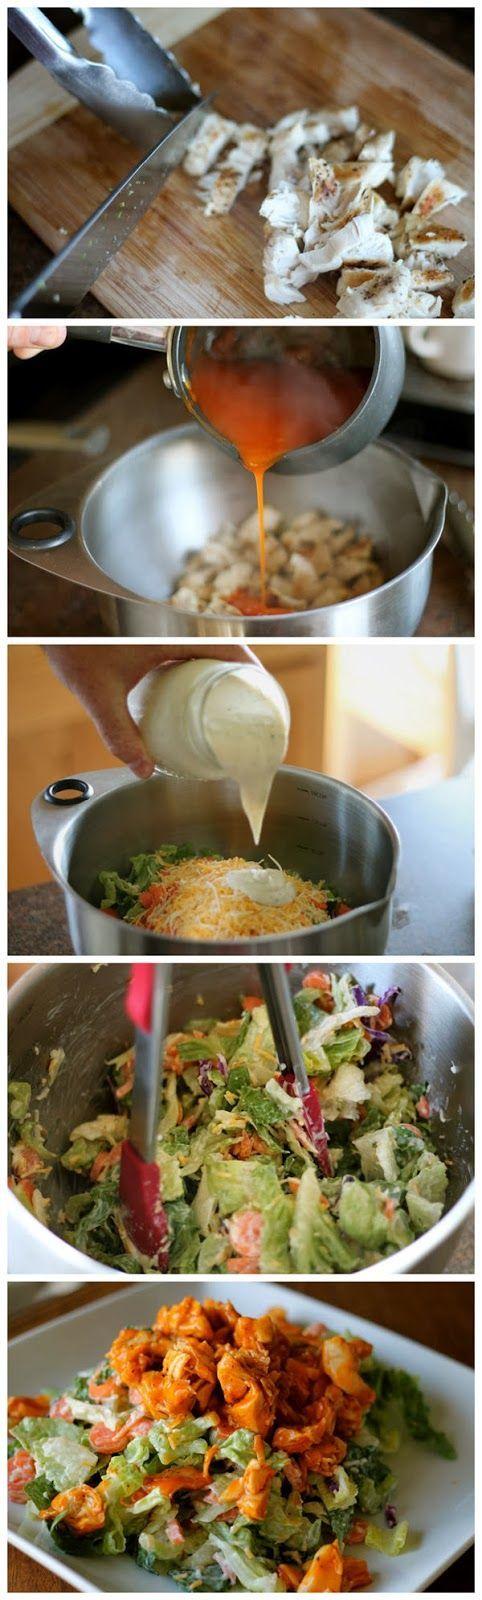 Chopped Buffalo Chicken Salad ♥ , cooking amazing paleo recipes today with Paleo Recipe Book : http://www.thepaleorecipebooks.com